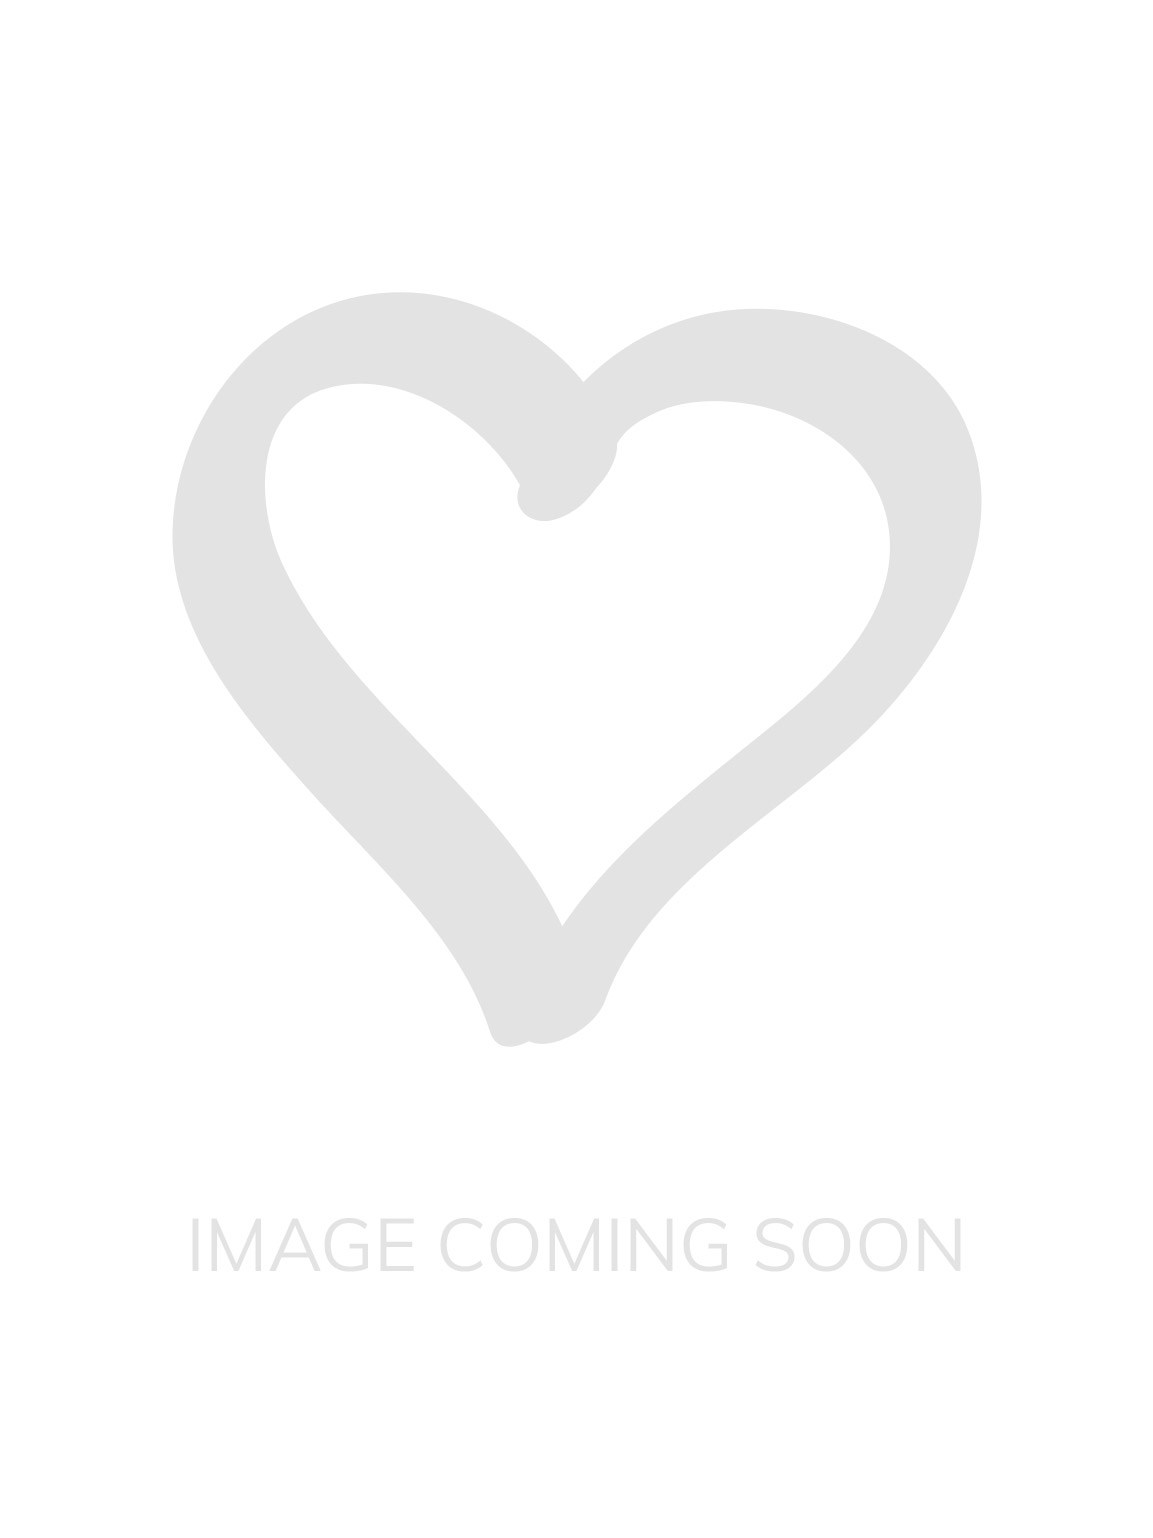 a038f6e02b Avero Round Shaped Bra - Scarlet